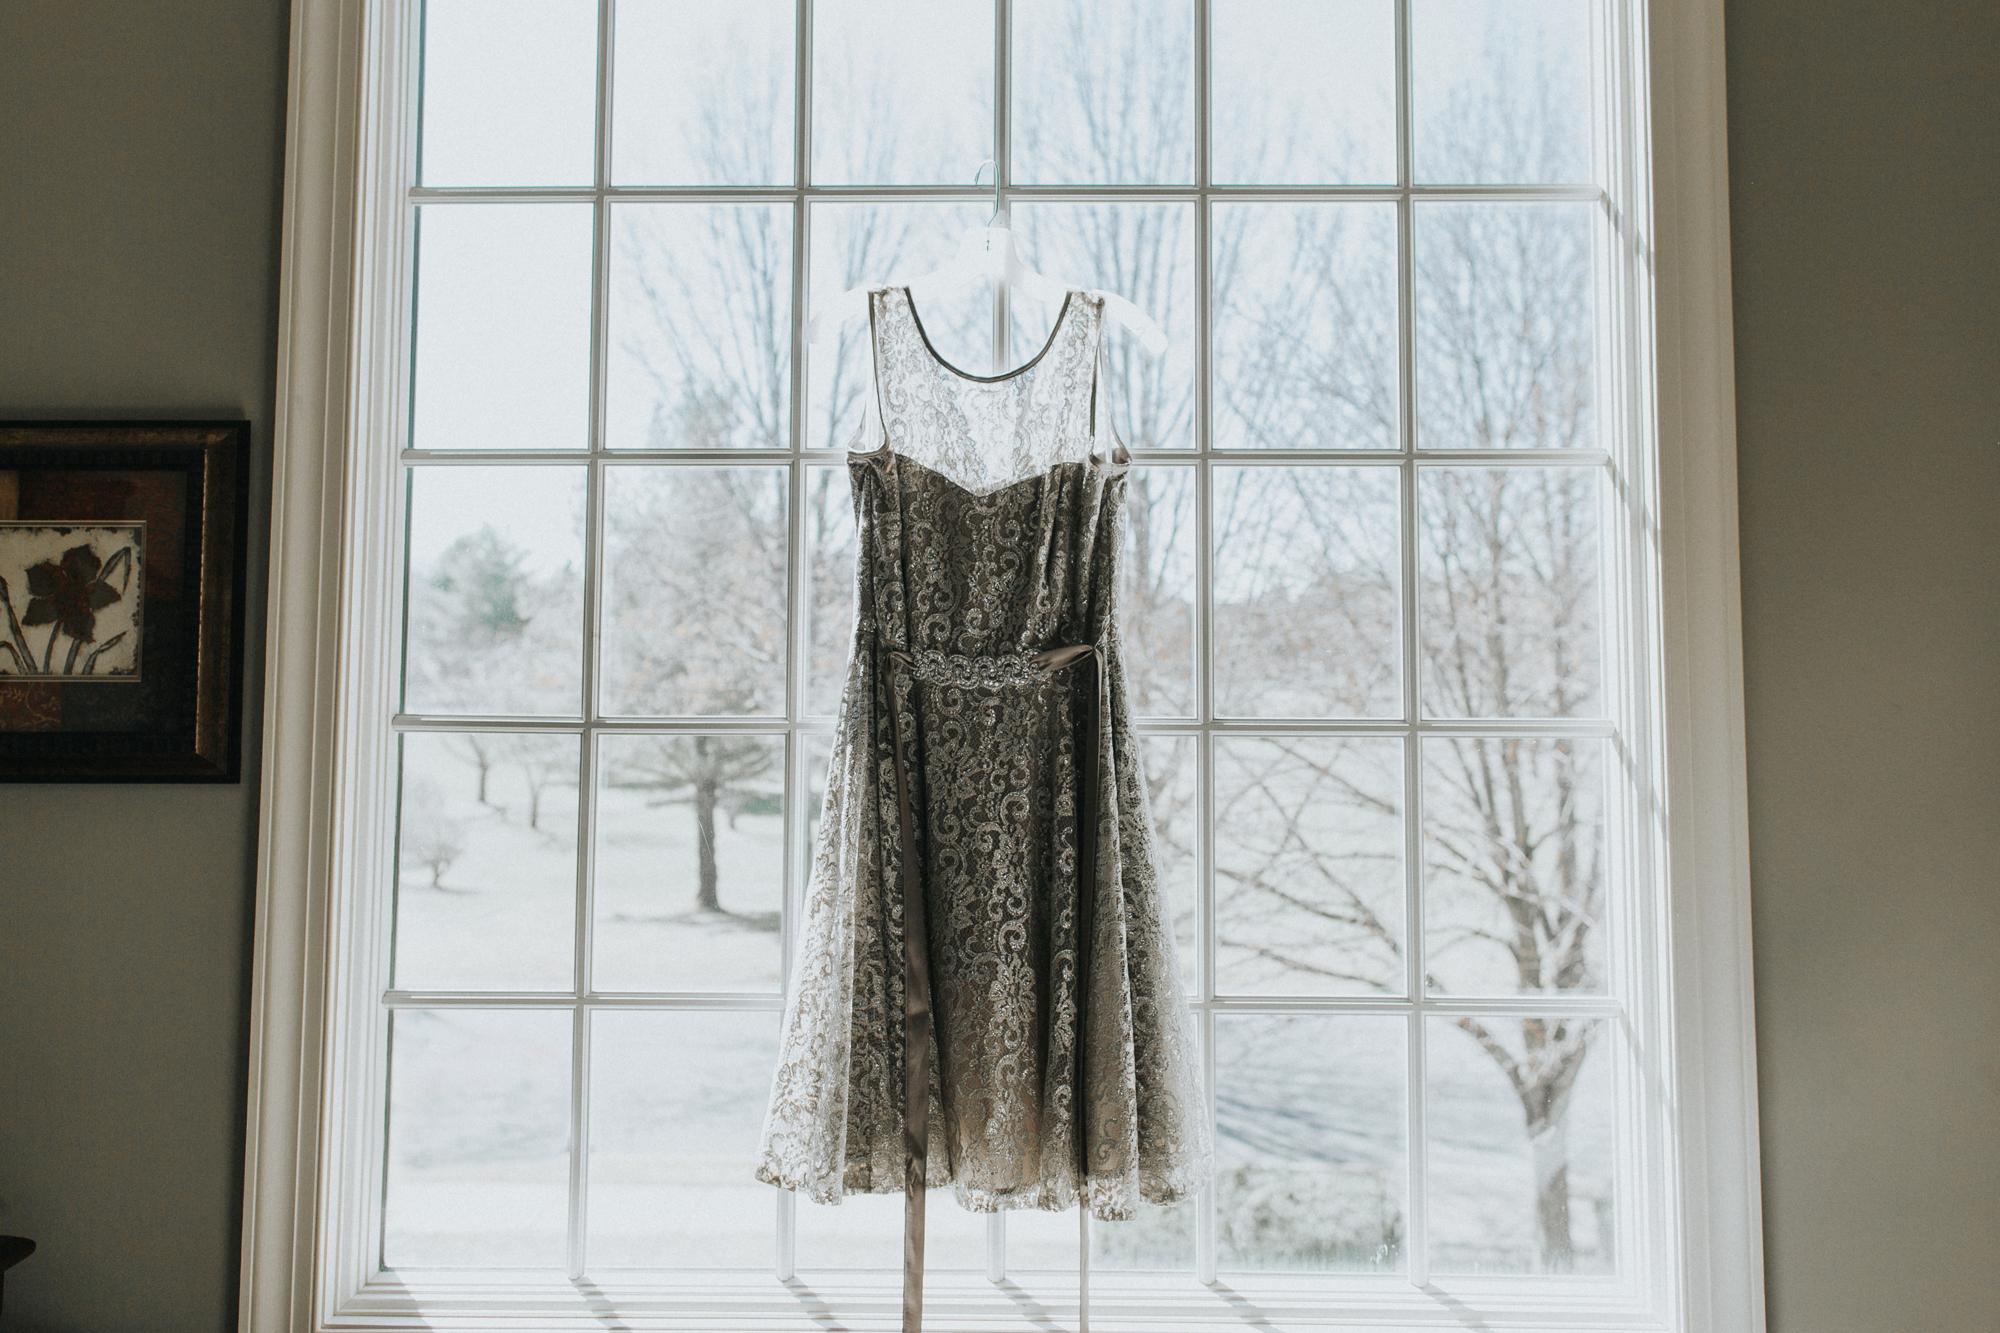 palmer-township-bath-pennsylvania-wedding-dress